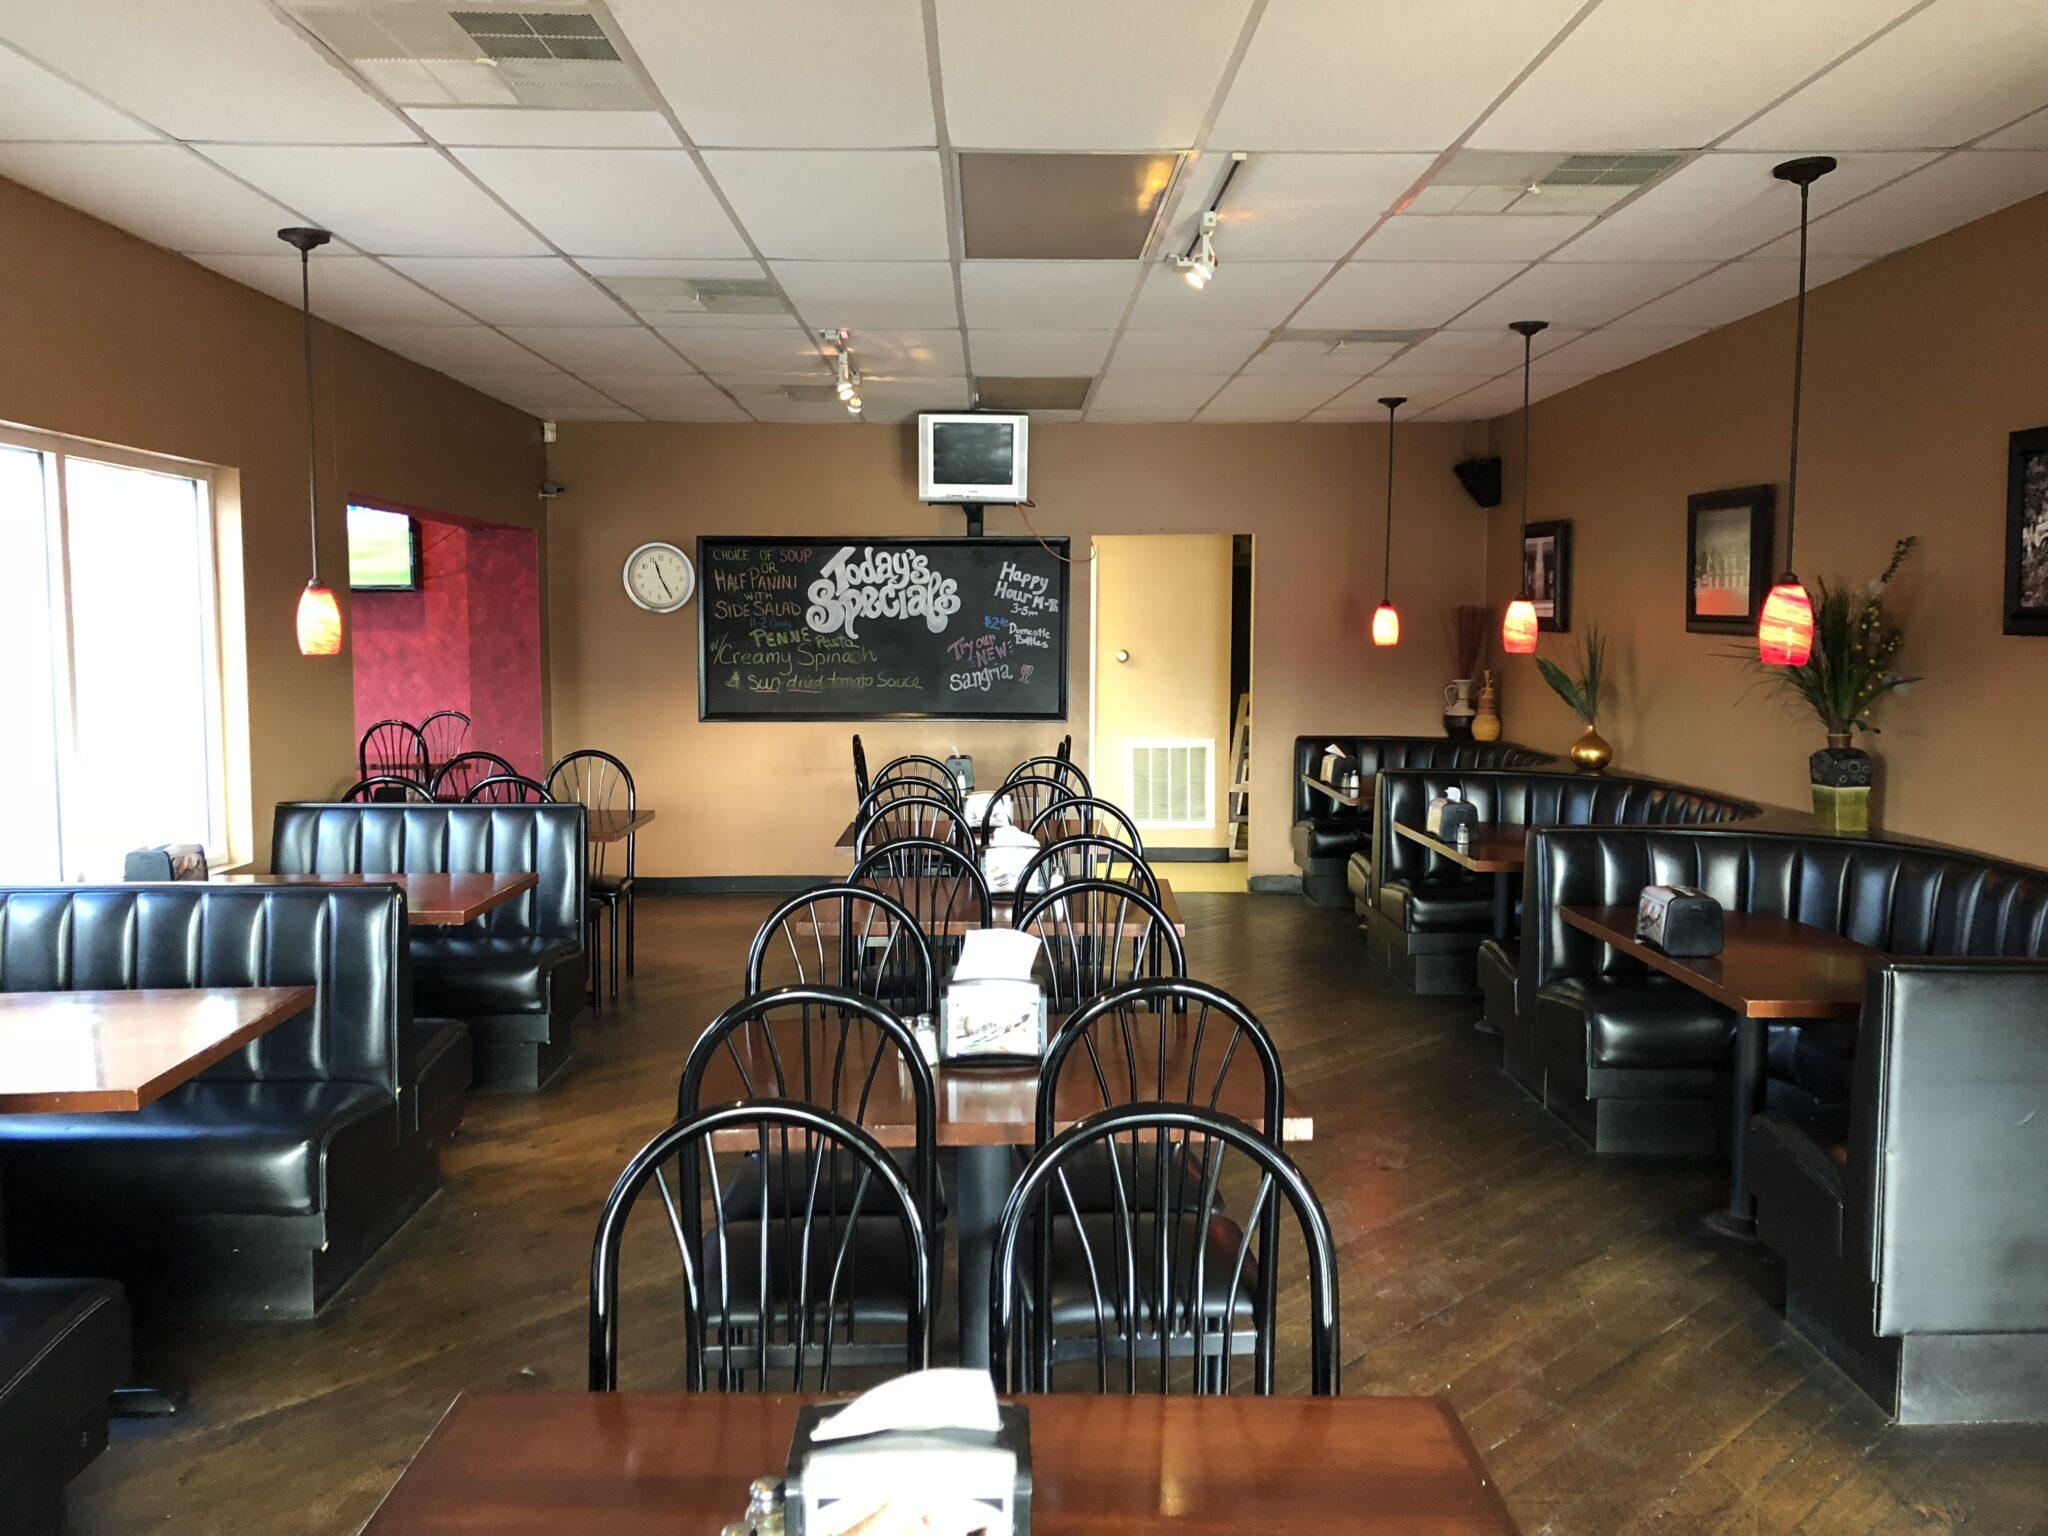 Restaurant Pizza & Grill